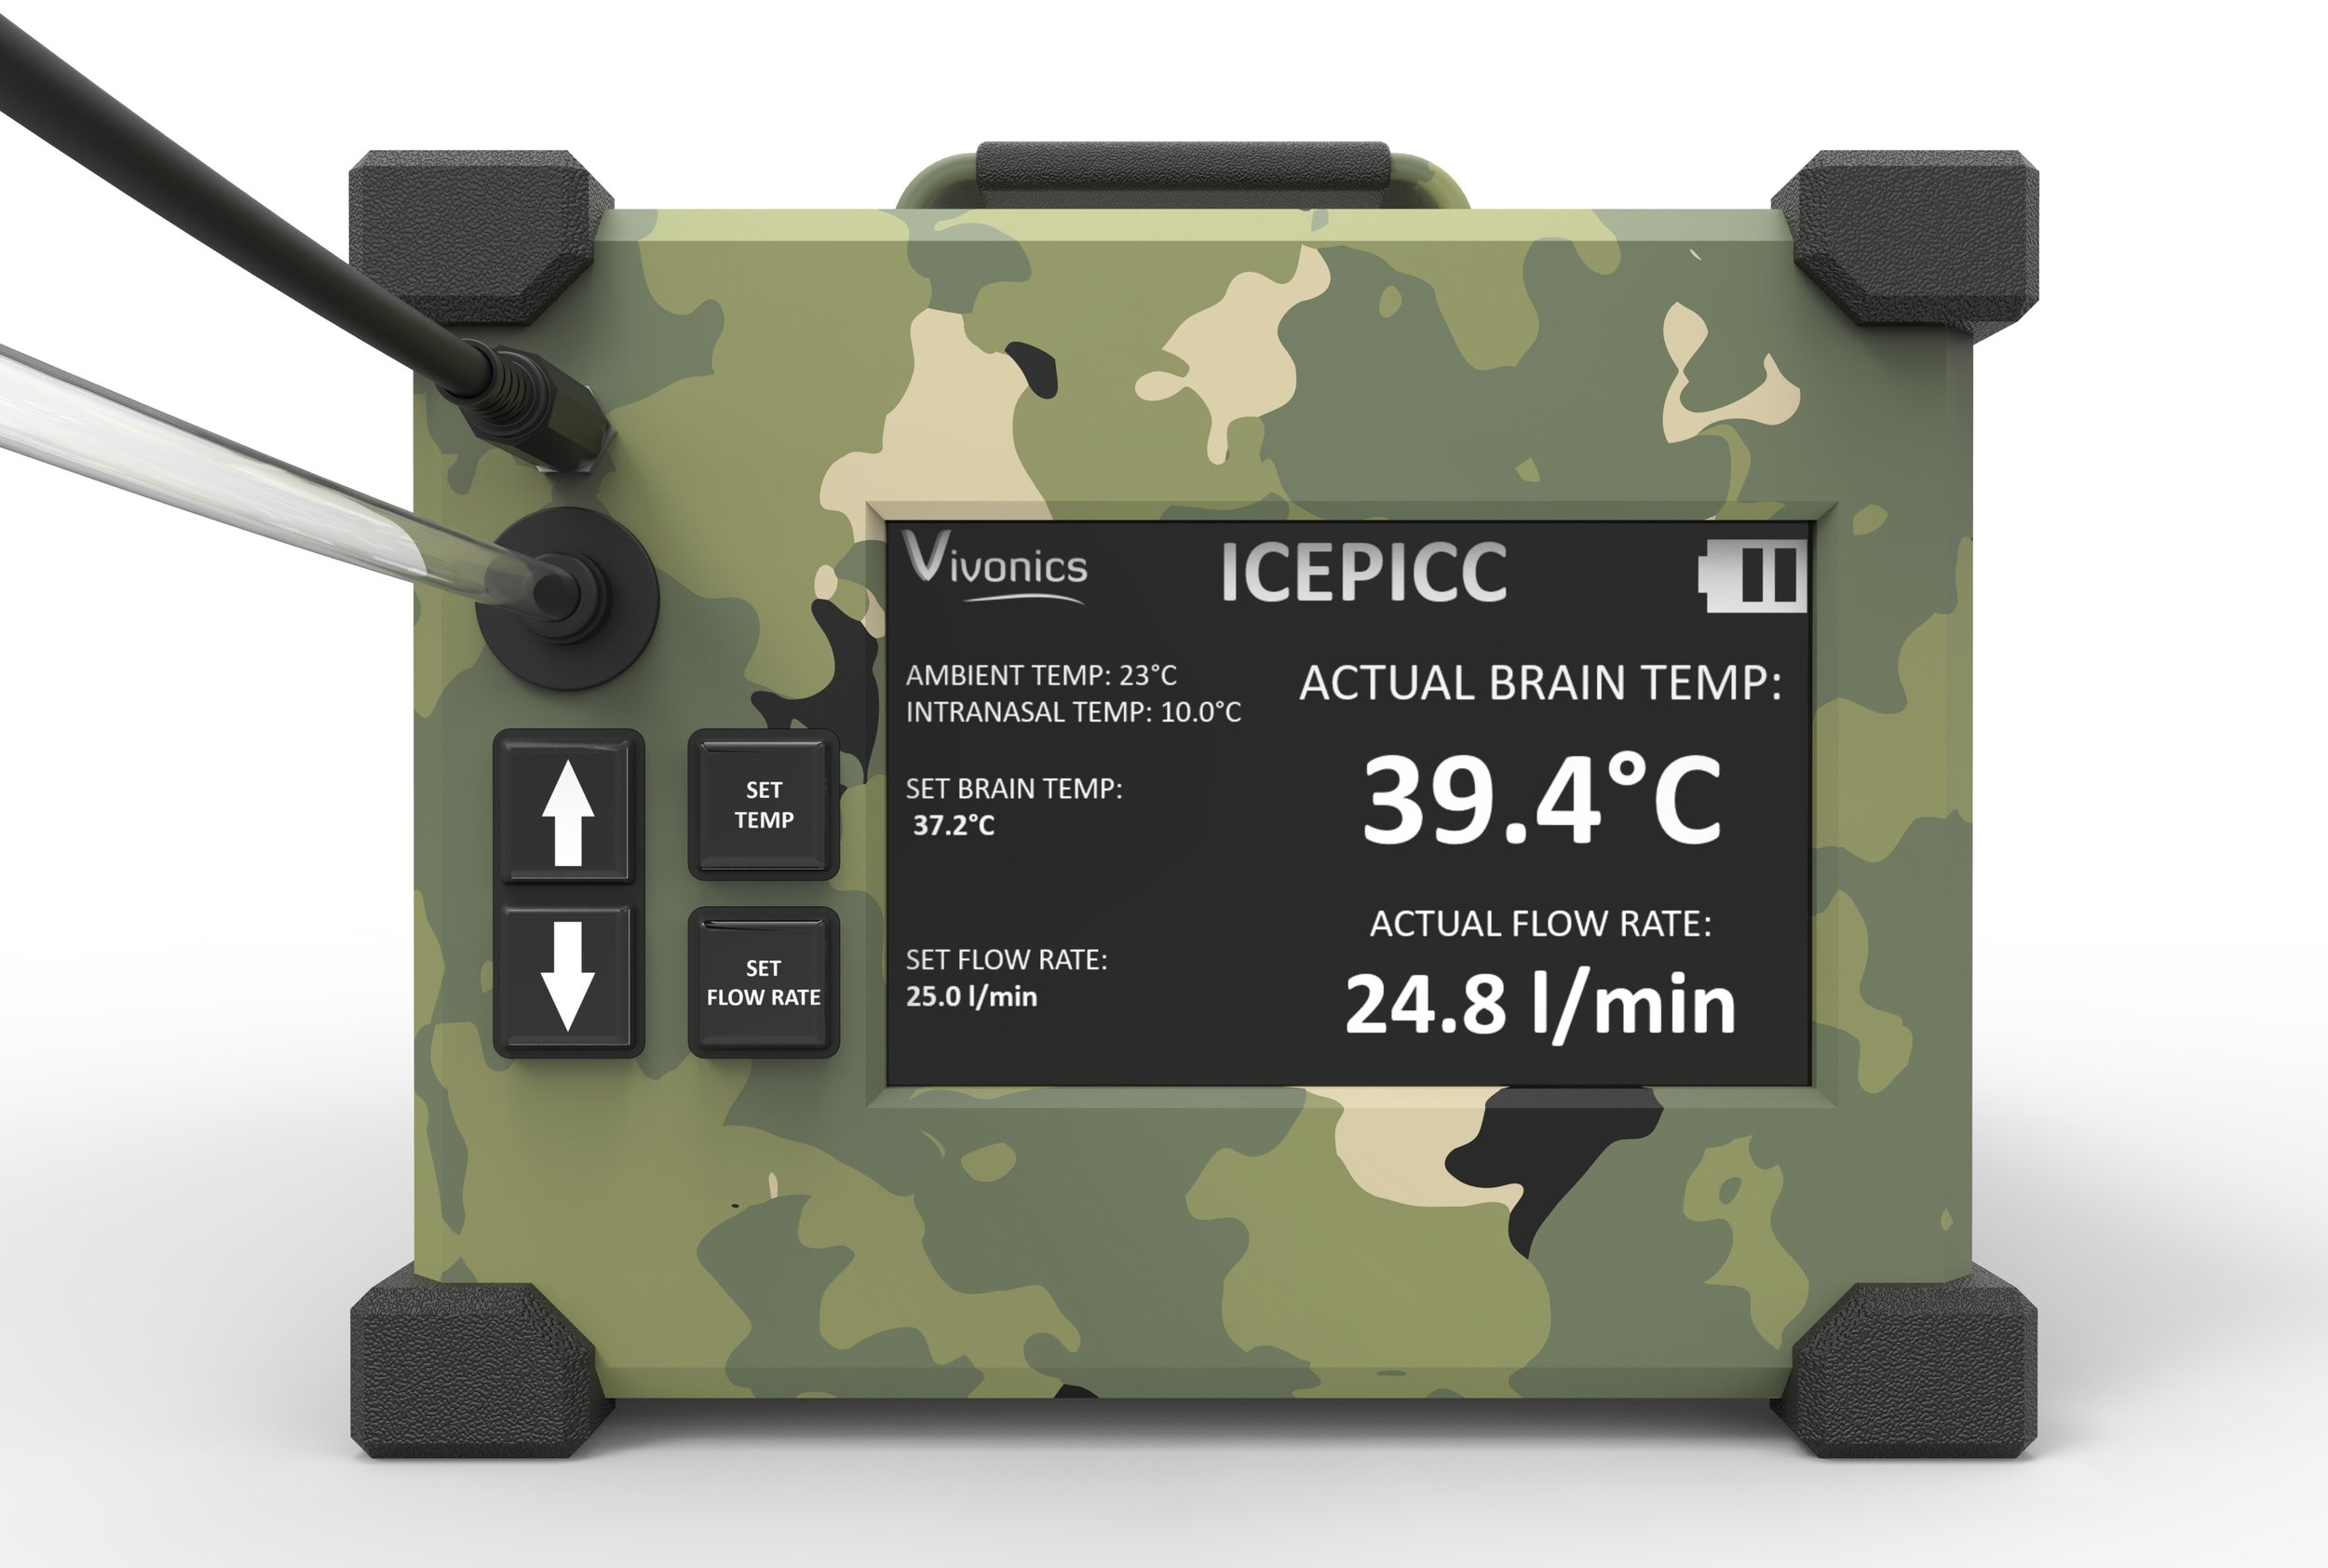 ICEPICC Handheld Unit Render v1.123.jpg